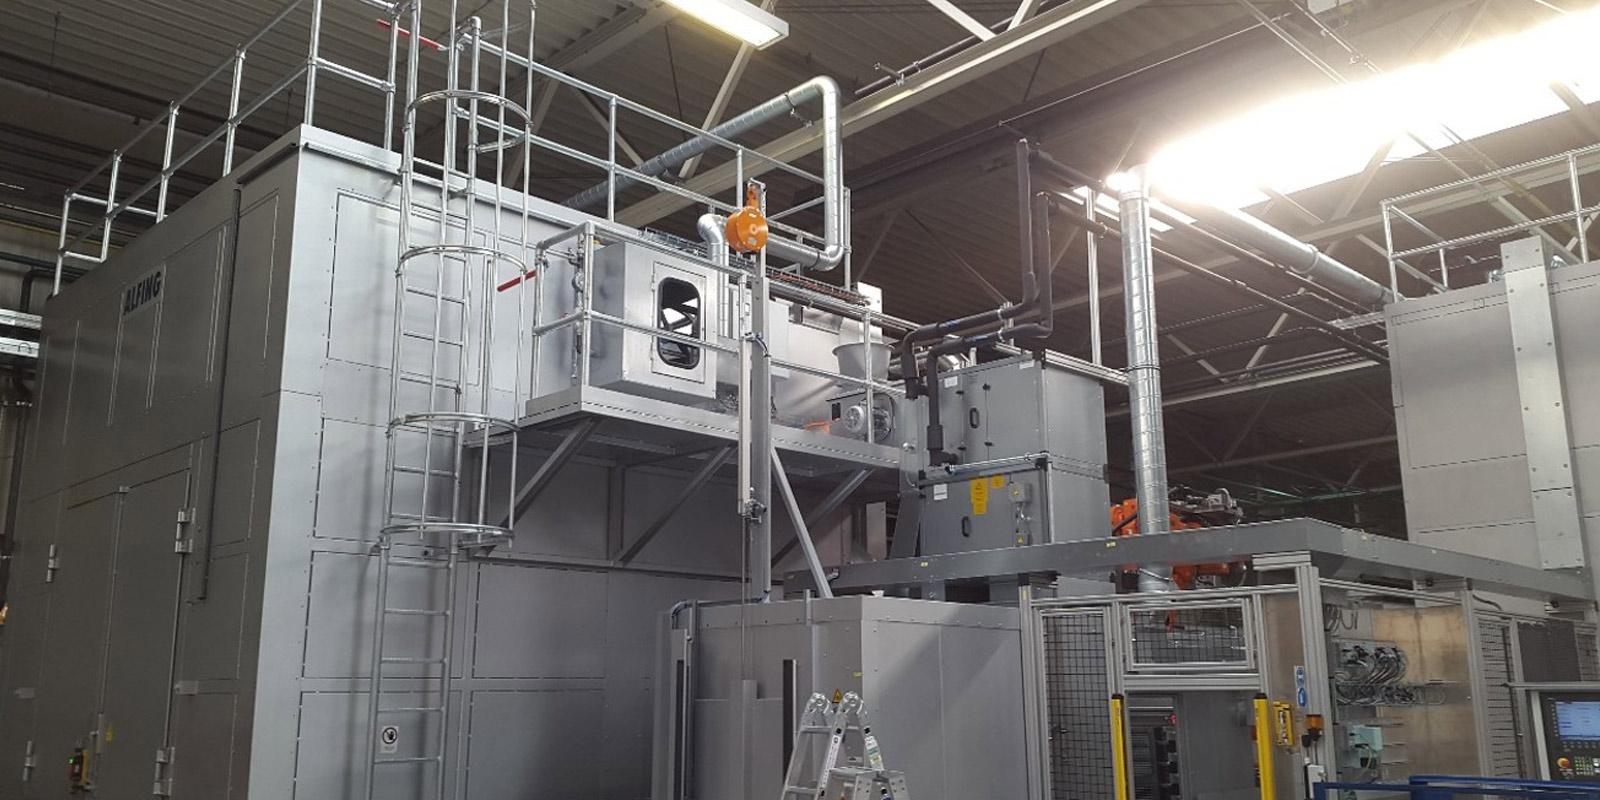 ELT Entstaubungs- & Lufttechnik - Anlagenbau Trocknung